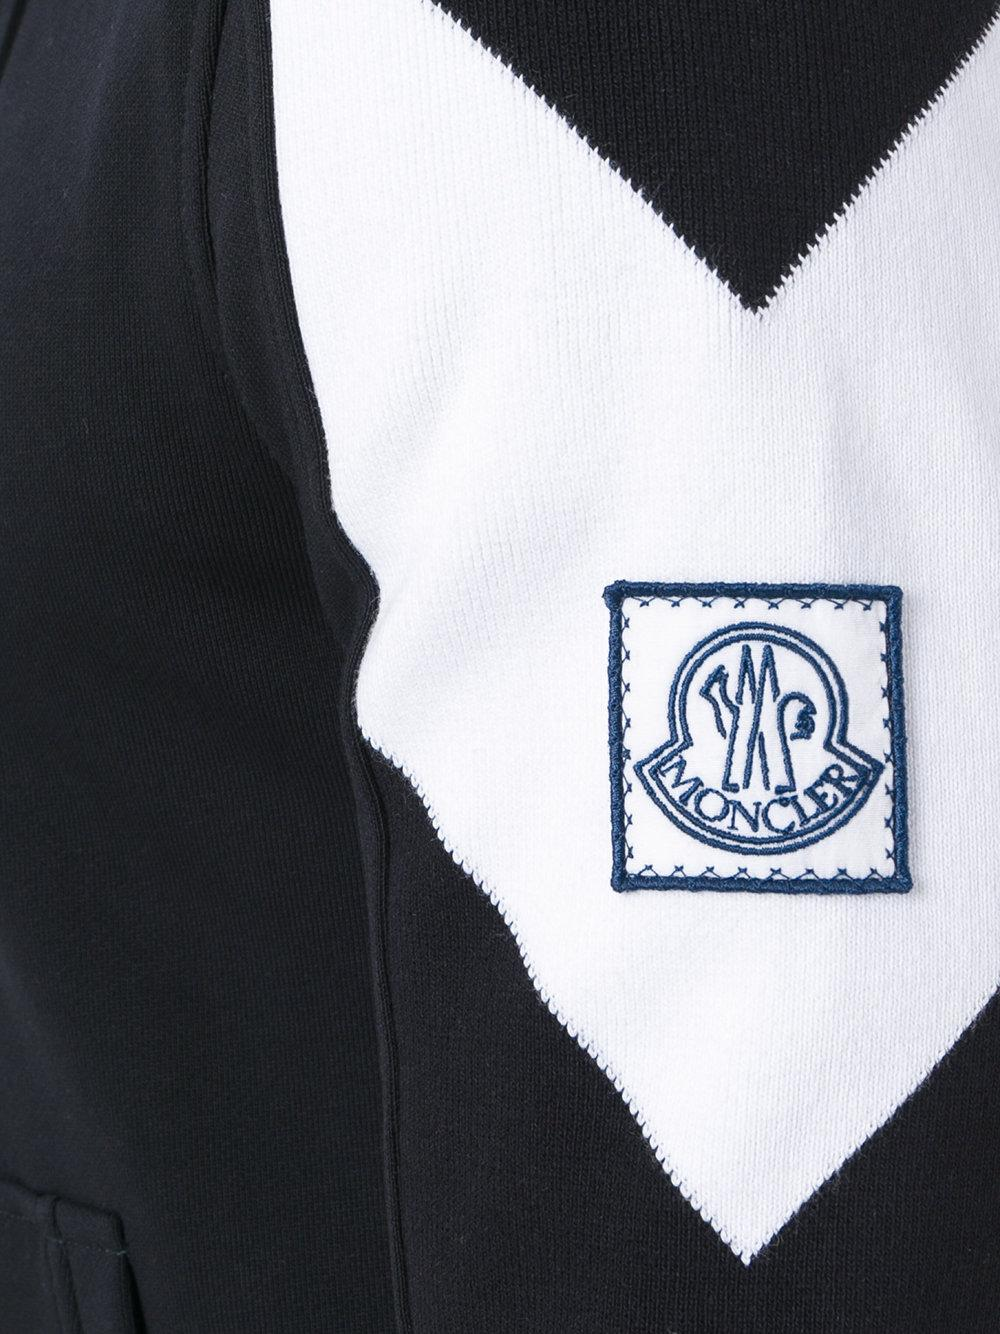 Moncler Gamme Bleu Cotton Logo Plaque Zipped Hoodie in Black for Men